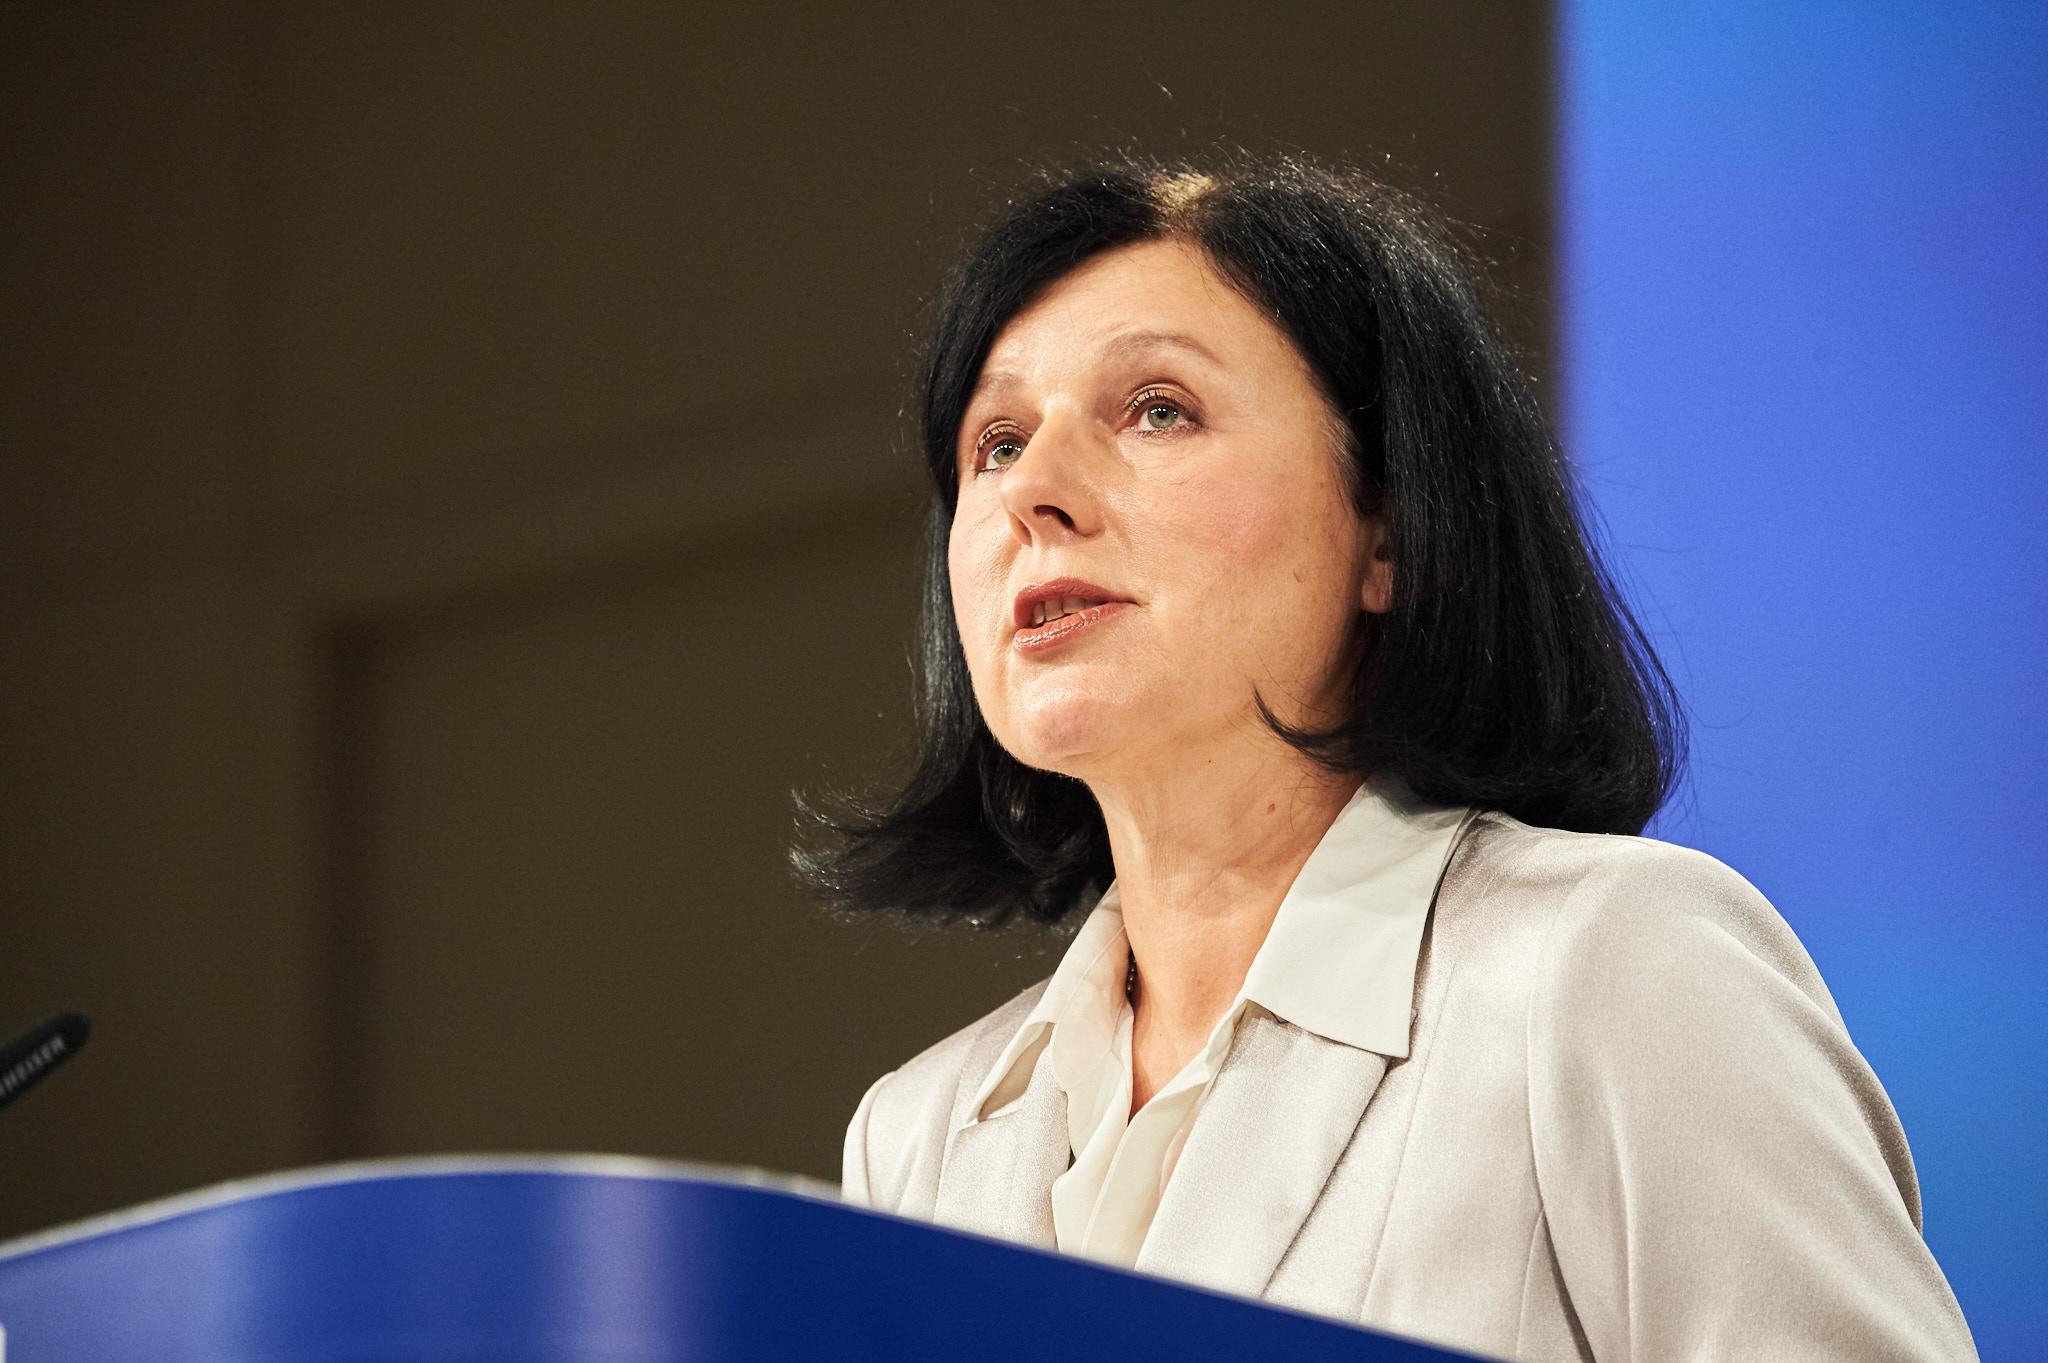 Government Spokesman Calls for EC Vice-President Jourova's Resignation